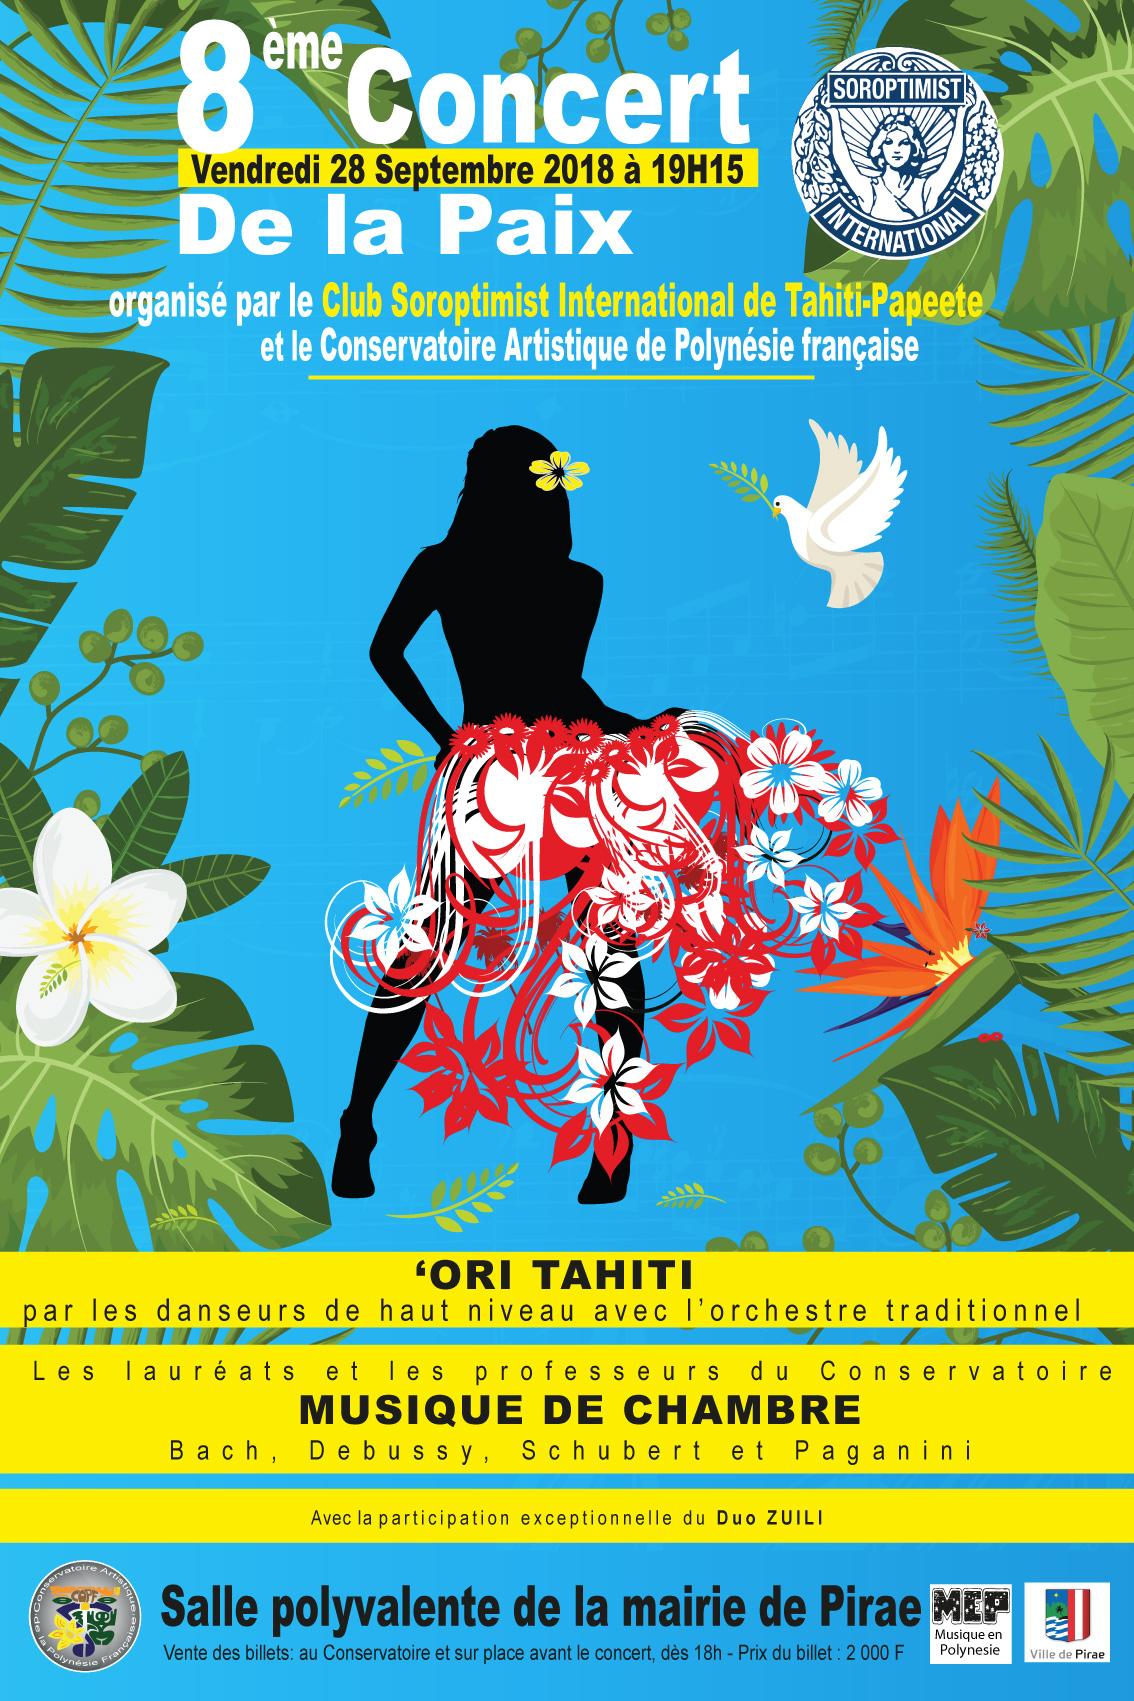 La 8e édition du Concert de la paix aura lieu vendredi